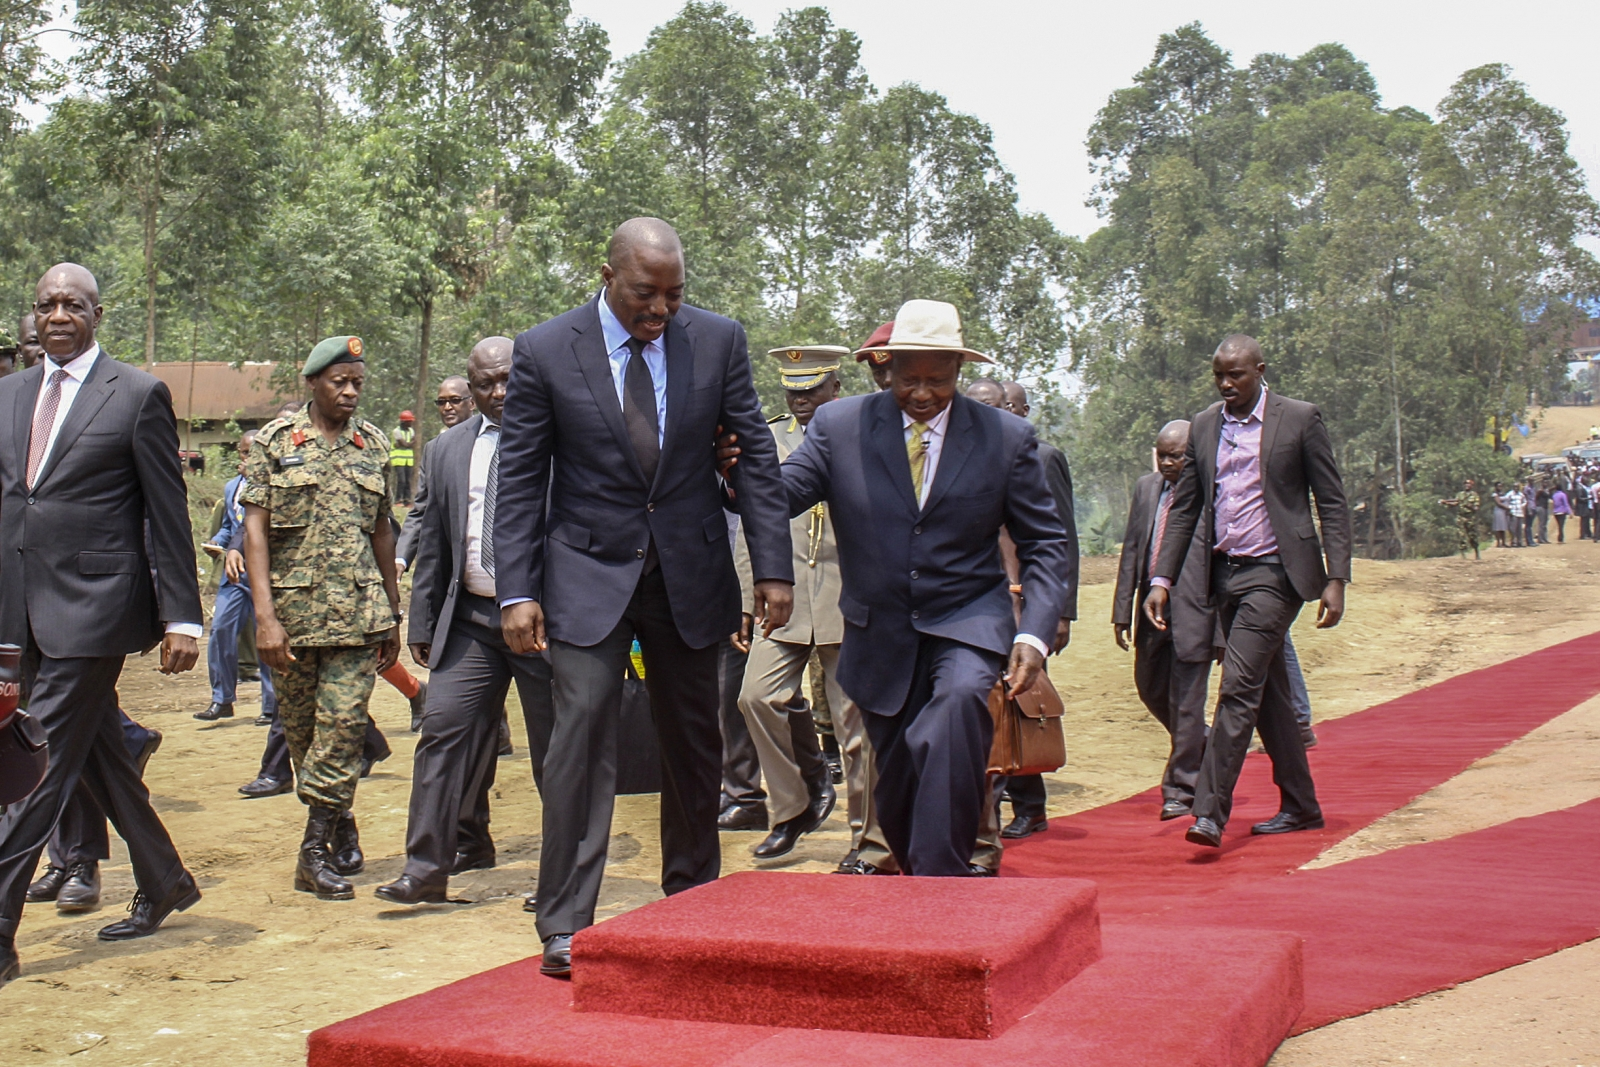 Joseph Kabila and Yoweri Museveni